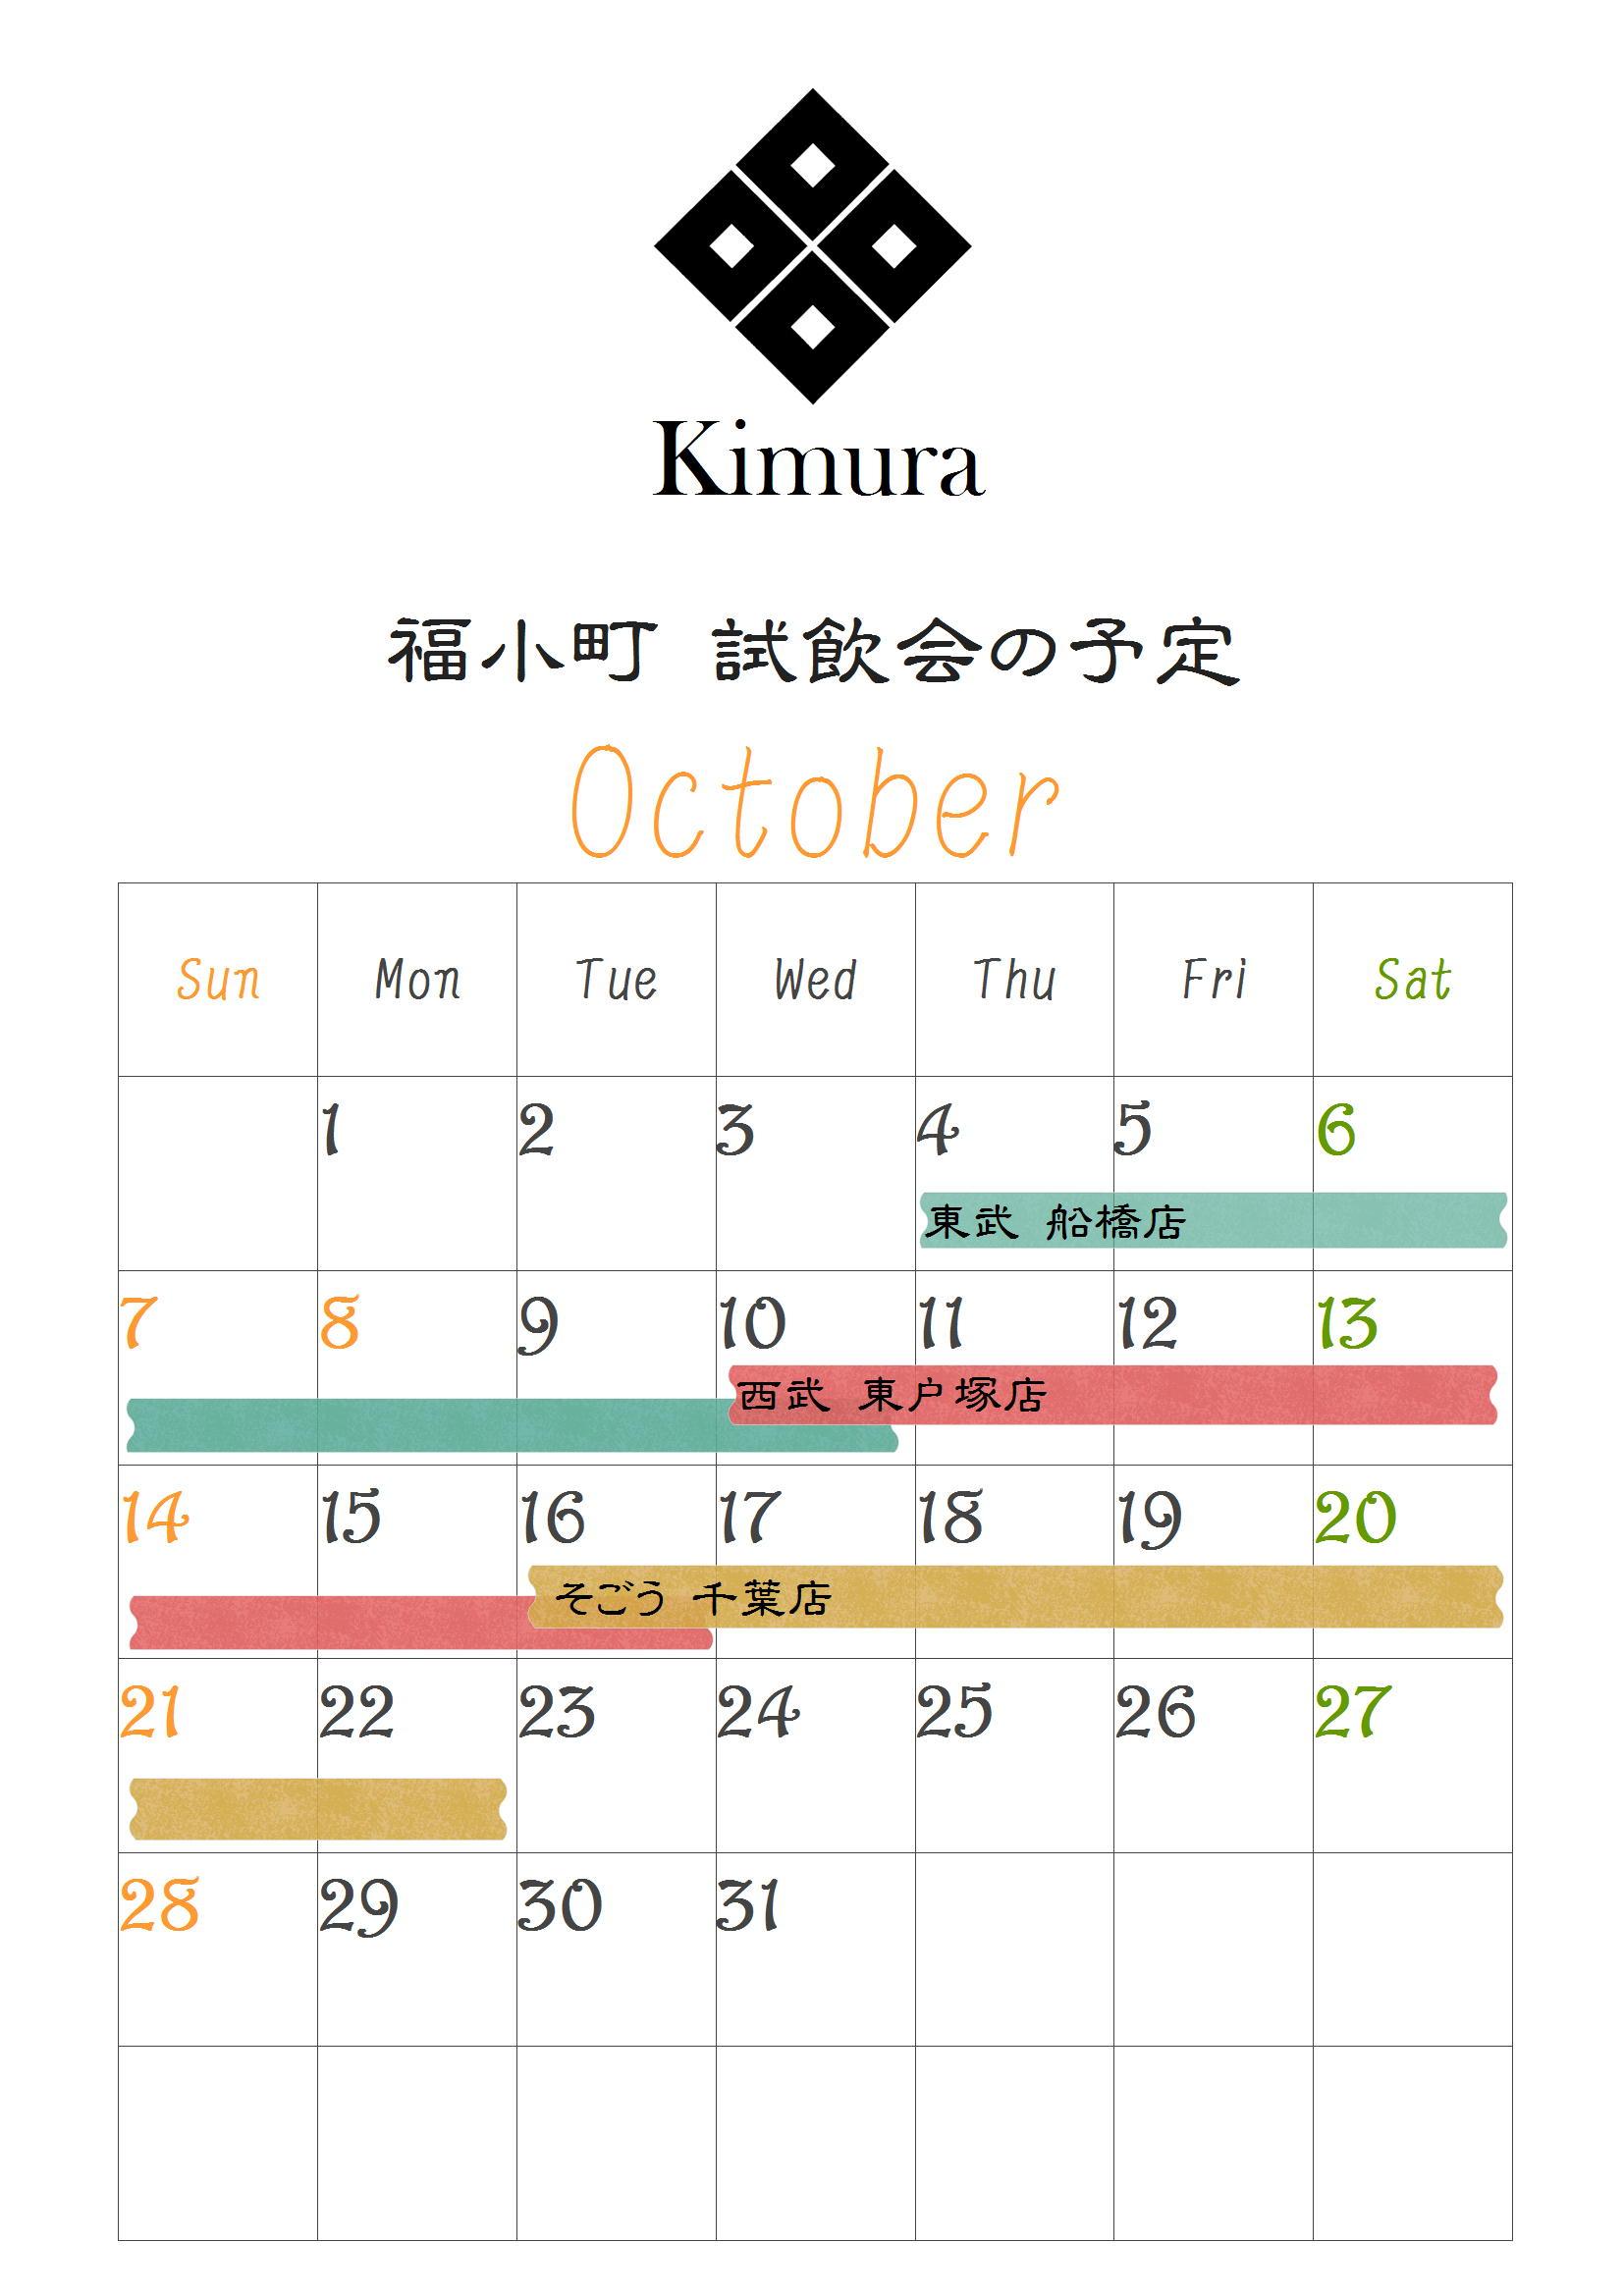 http://www.fukukomachi.com/blog/photo/20181004.JPG